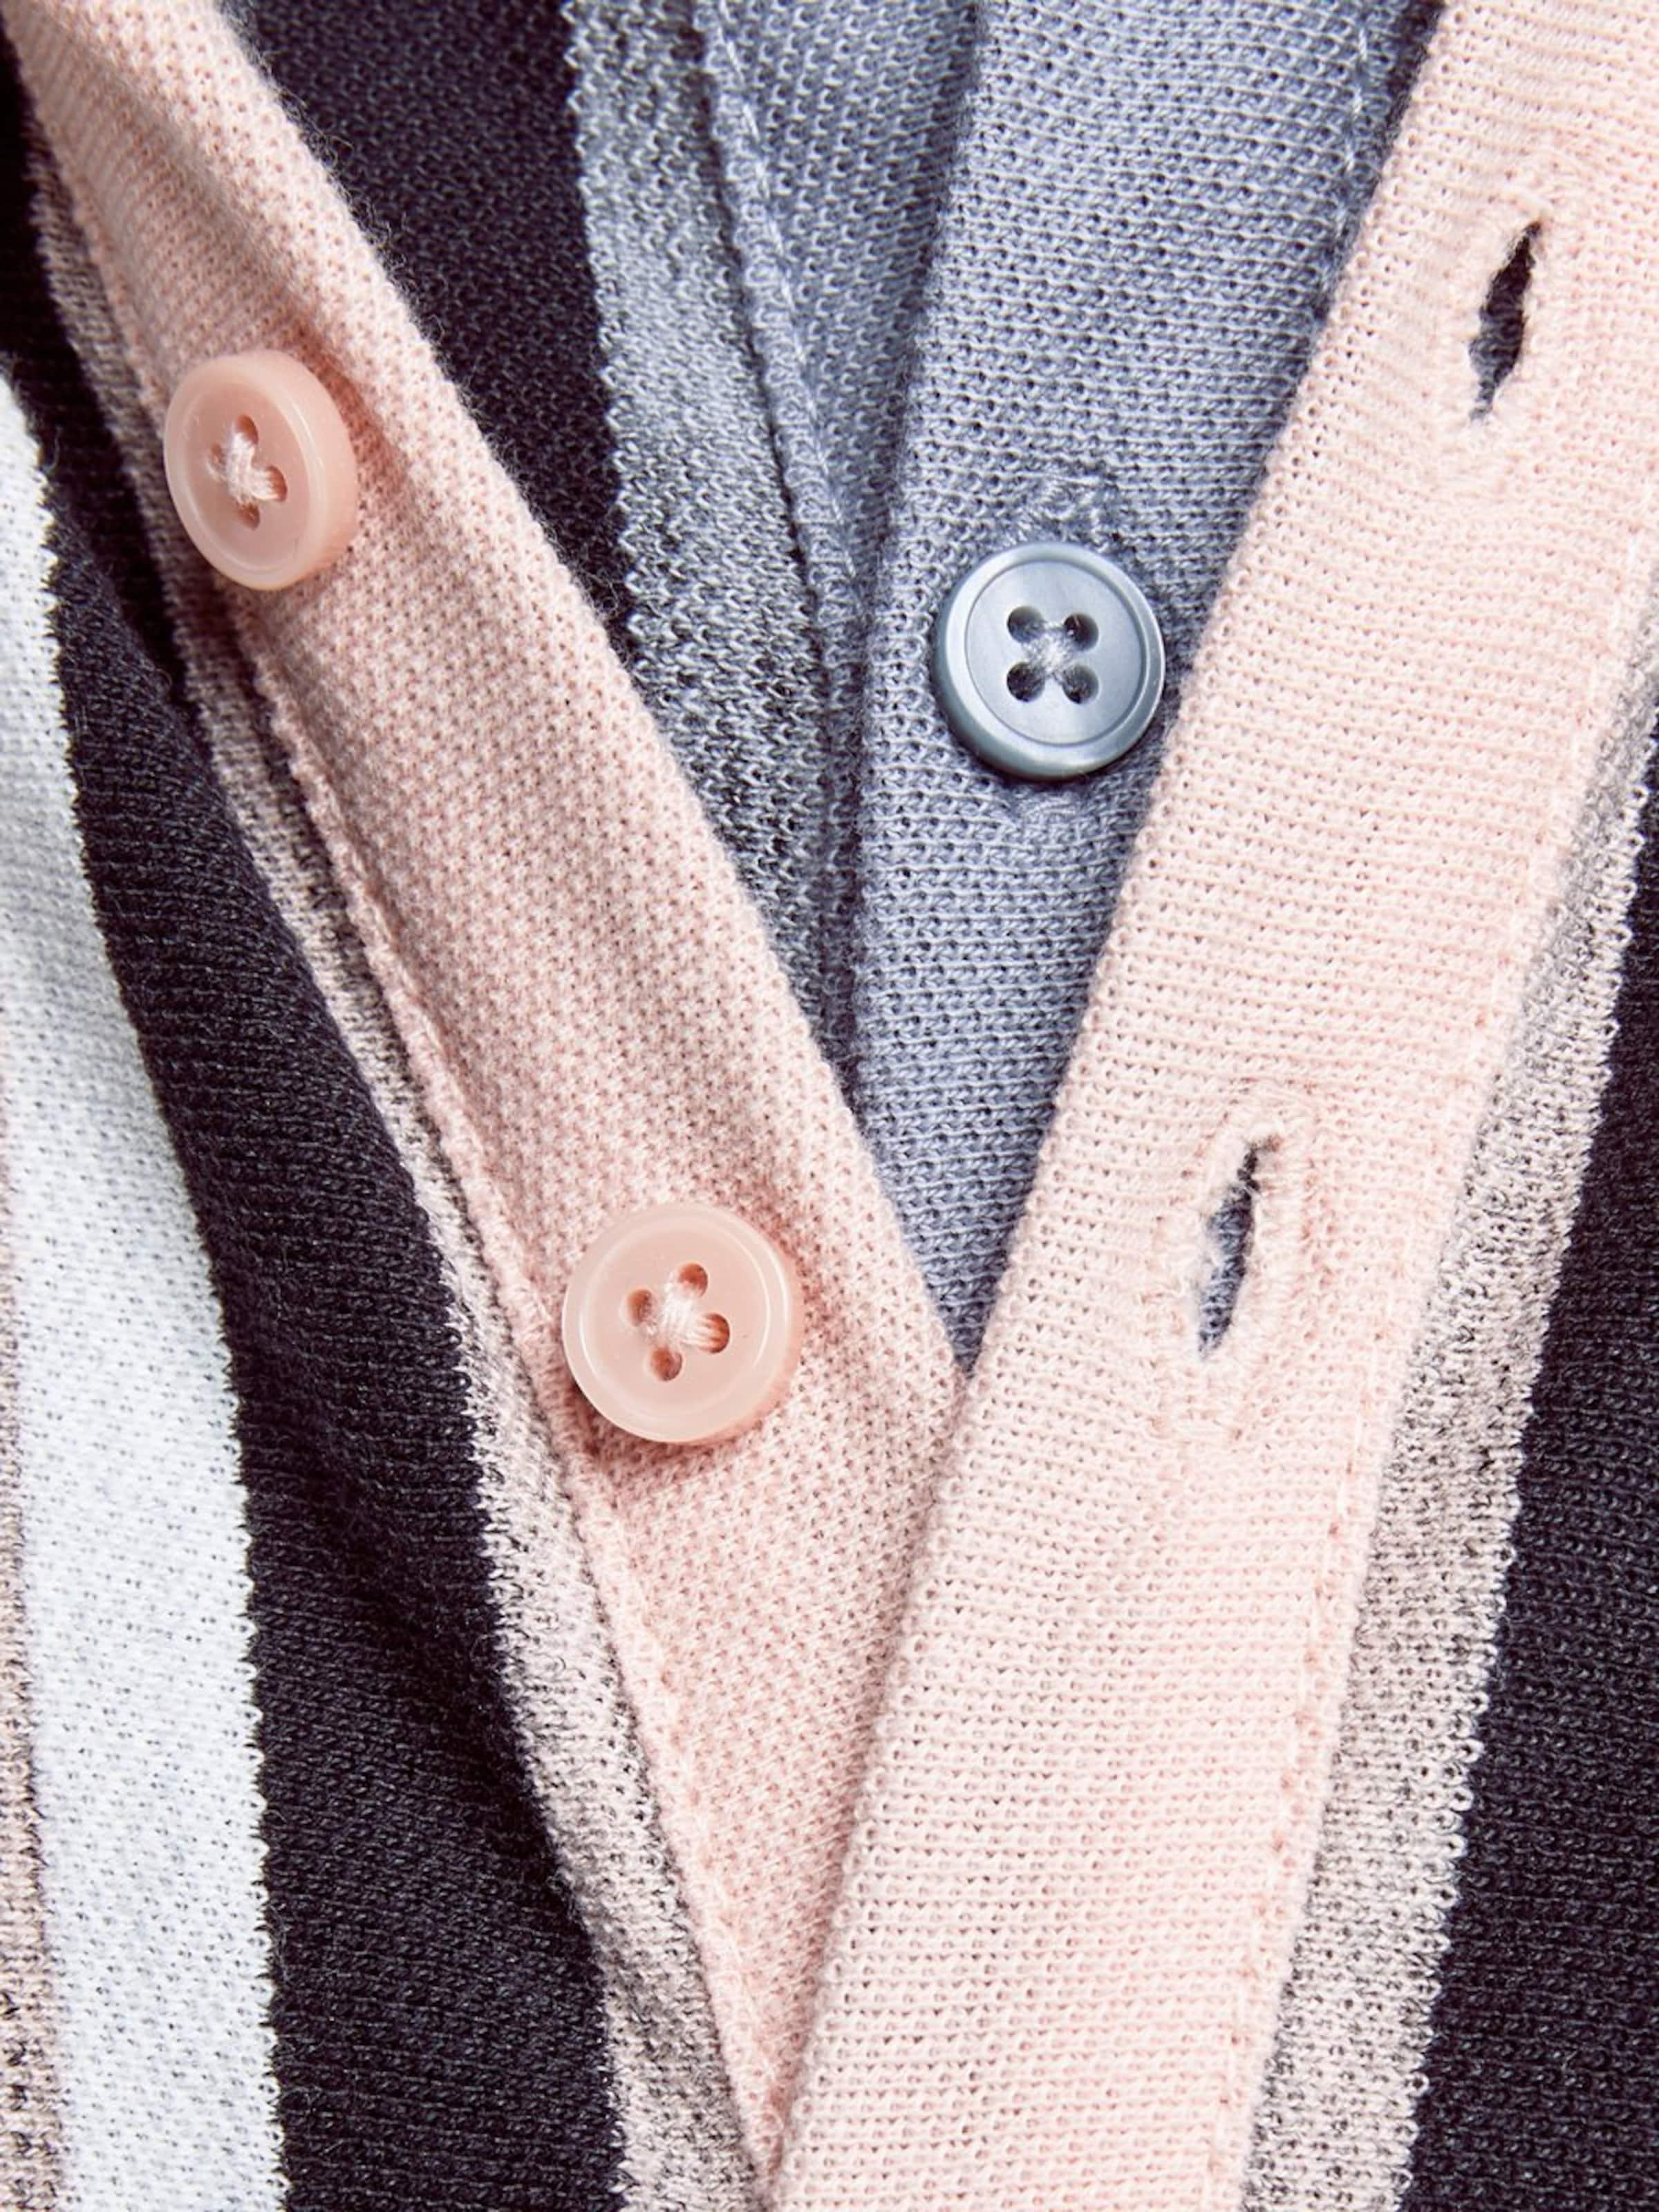 Jackamp; BeigeRosa Jones Poloshirt In Schwarz c1l3TJ5uFK